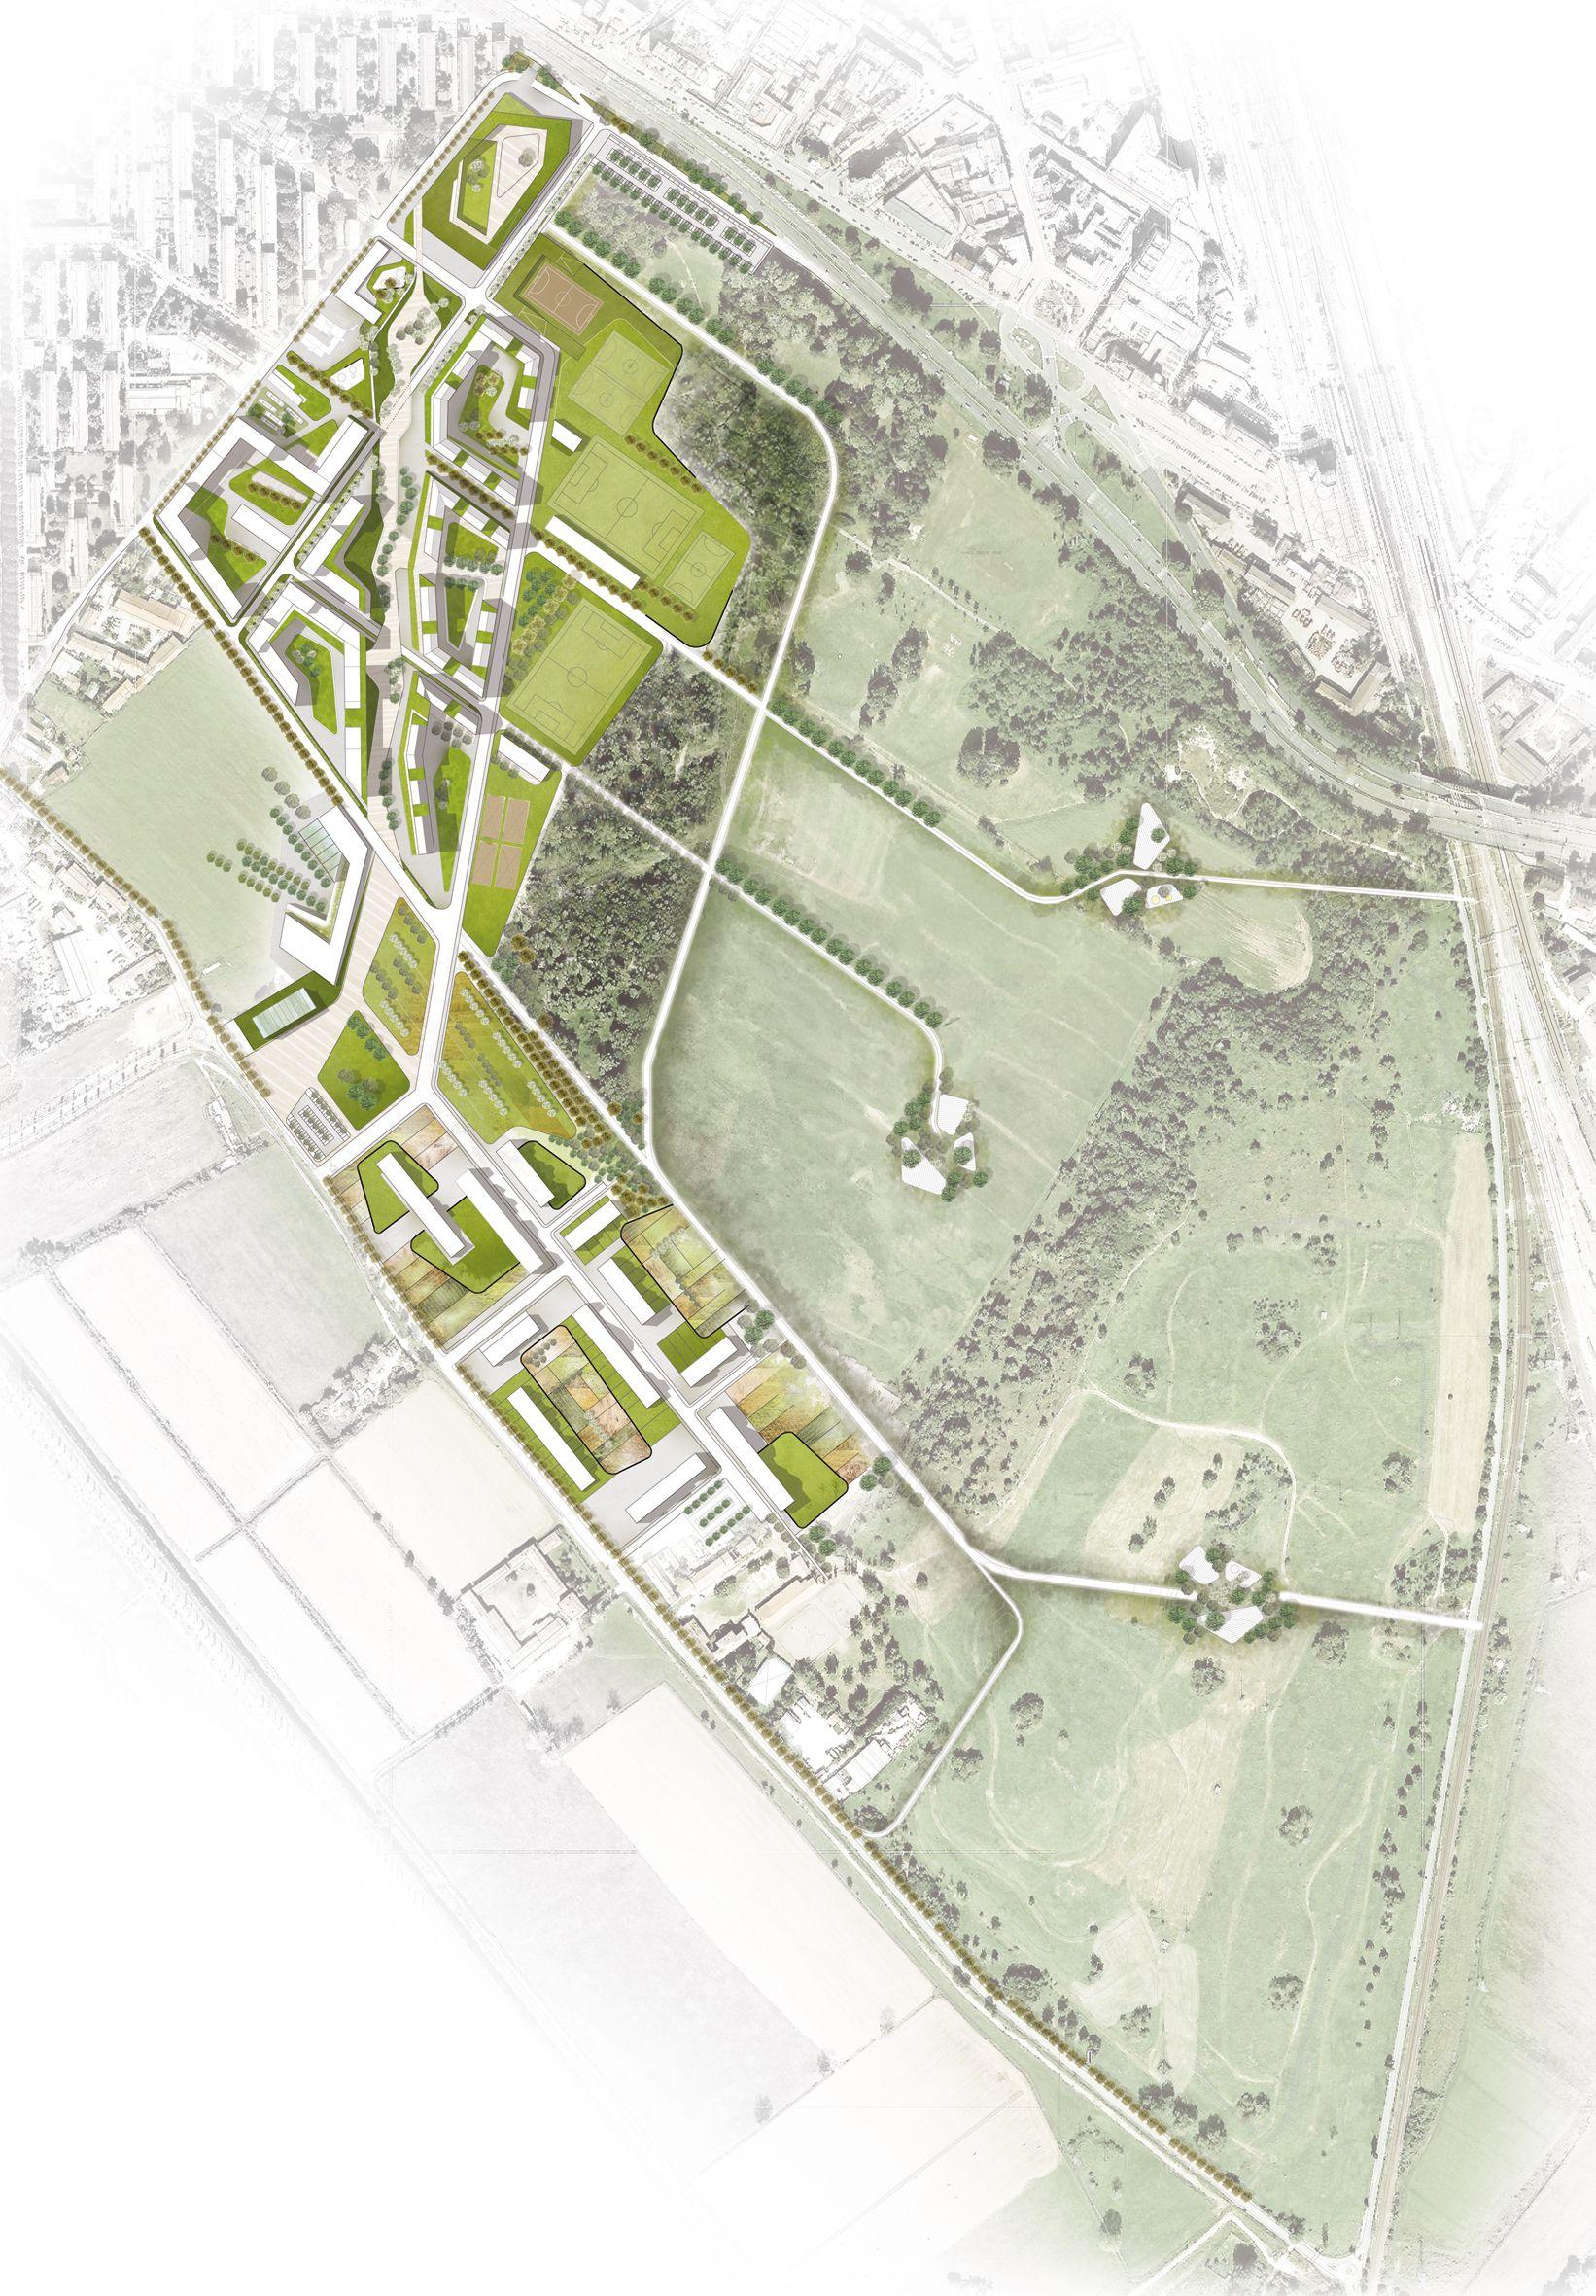 Europan 12 milano maria vittoria mastella laura mazzei for Bc landscape architects